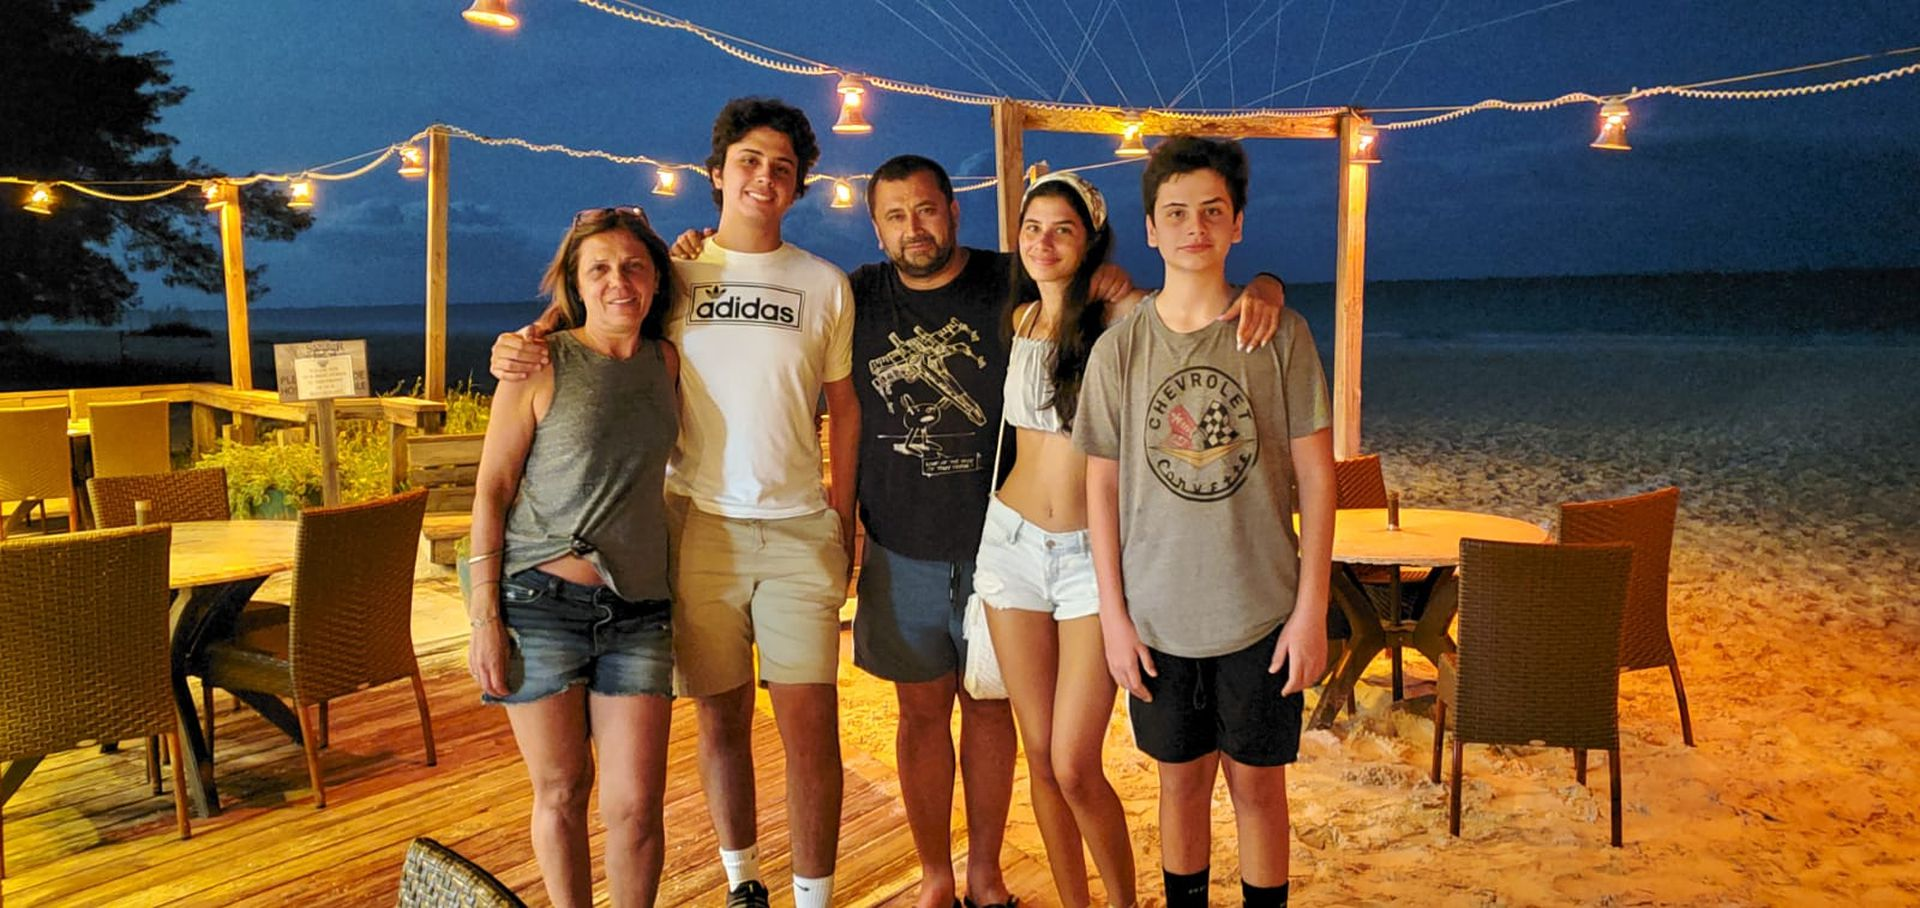 La familia Maldonado no se imagina regresando a la Argentina